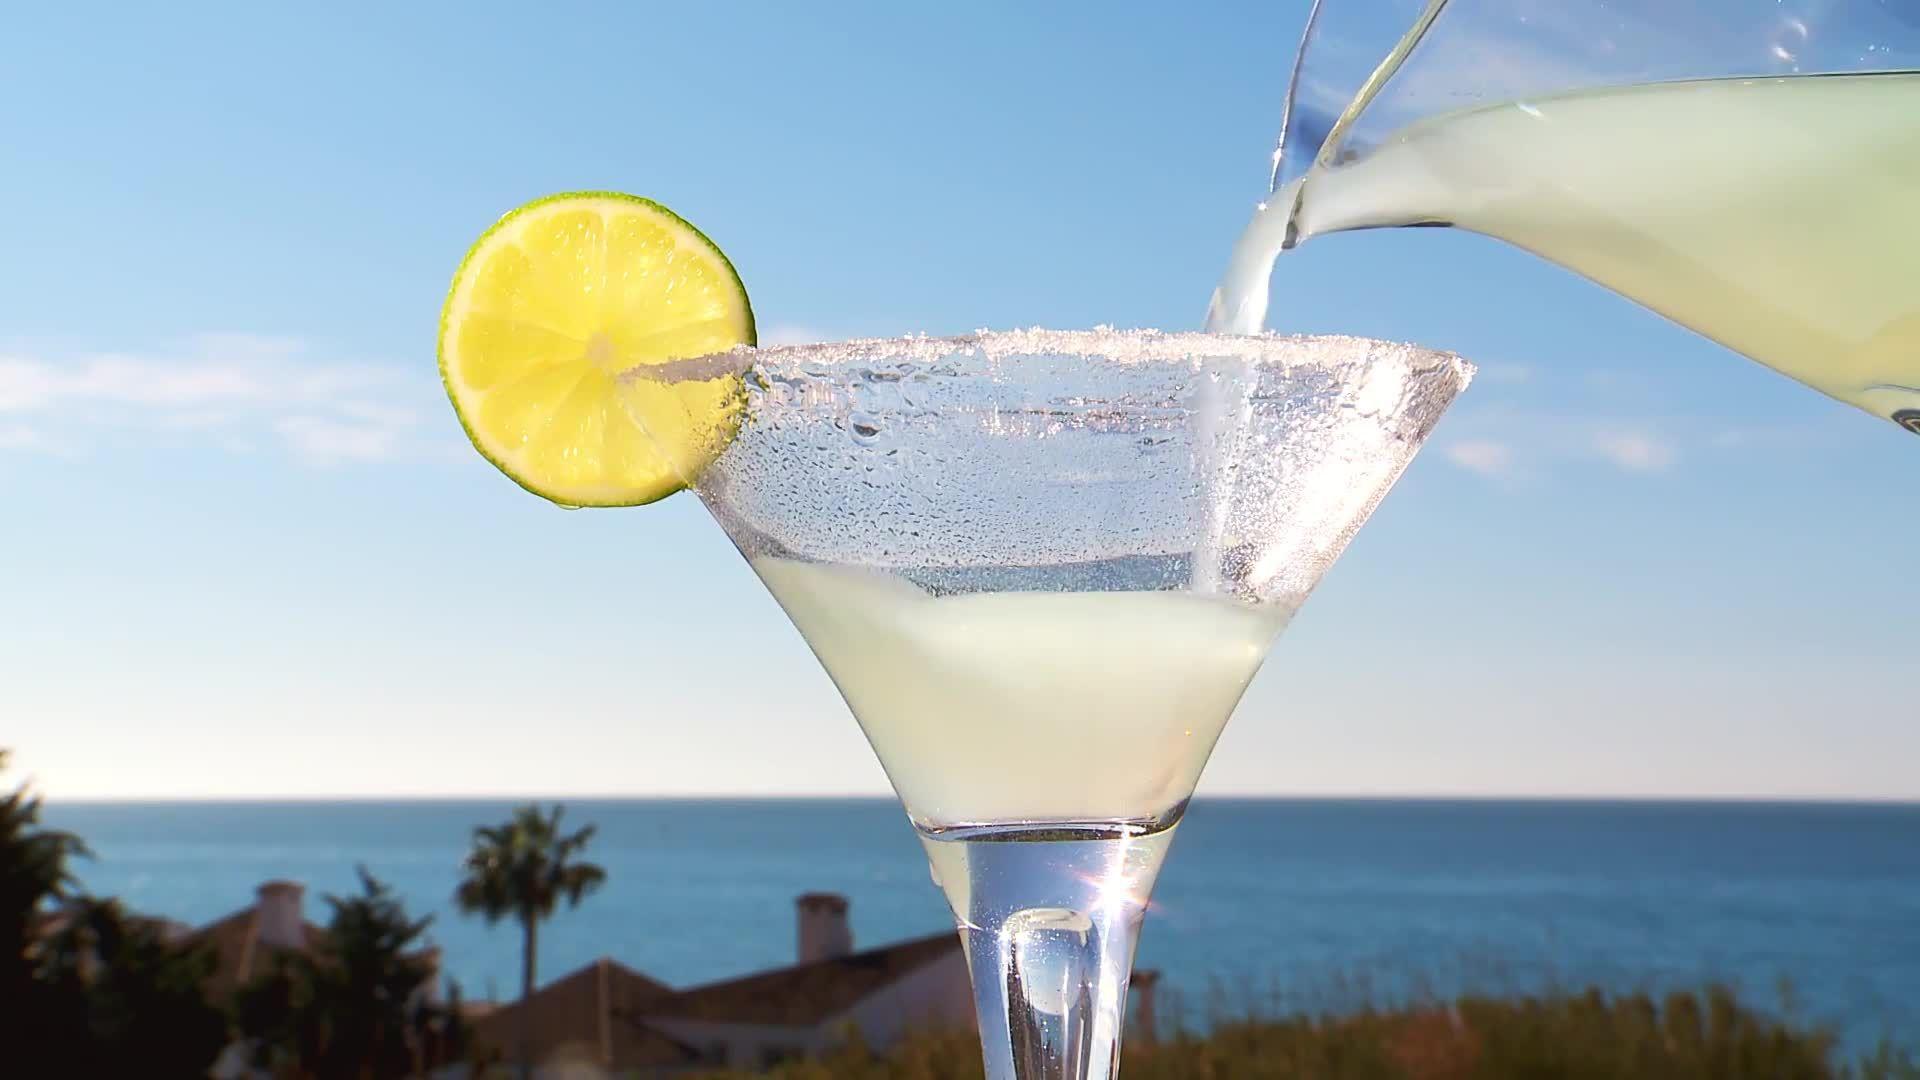 cntraveler_how-tequila-is-made.jpg